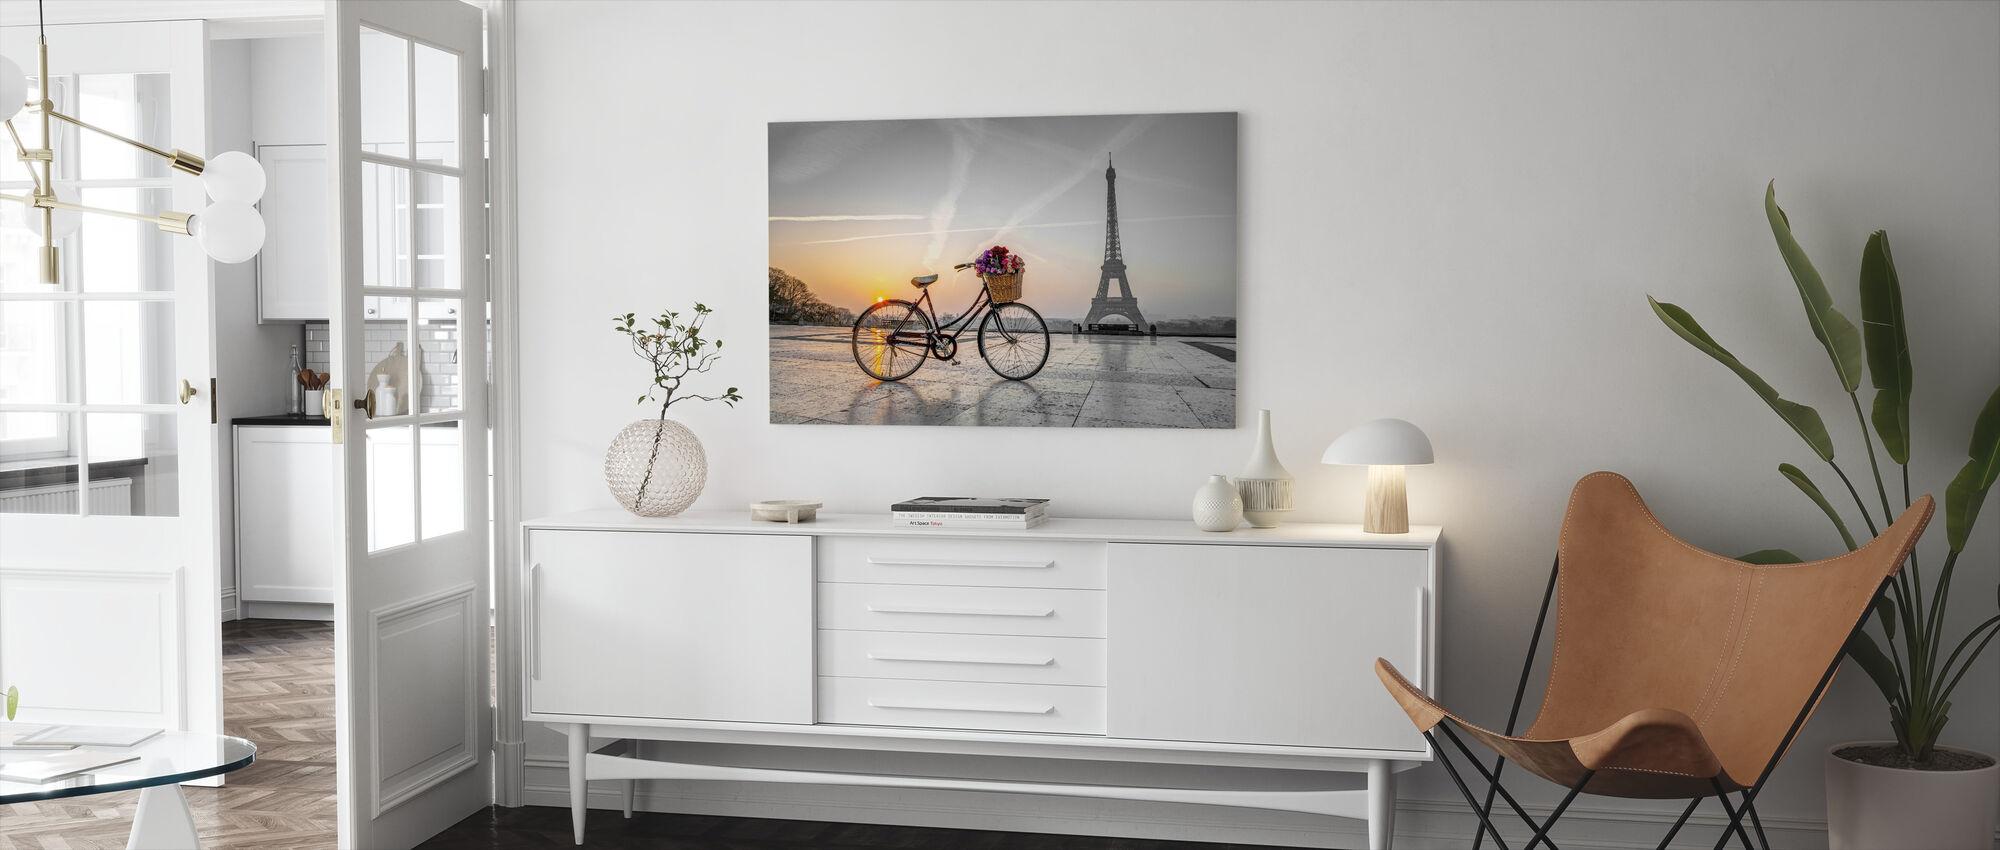 Bicycle Paris - Canvas print - Living Room